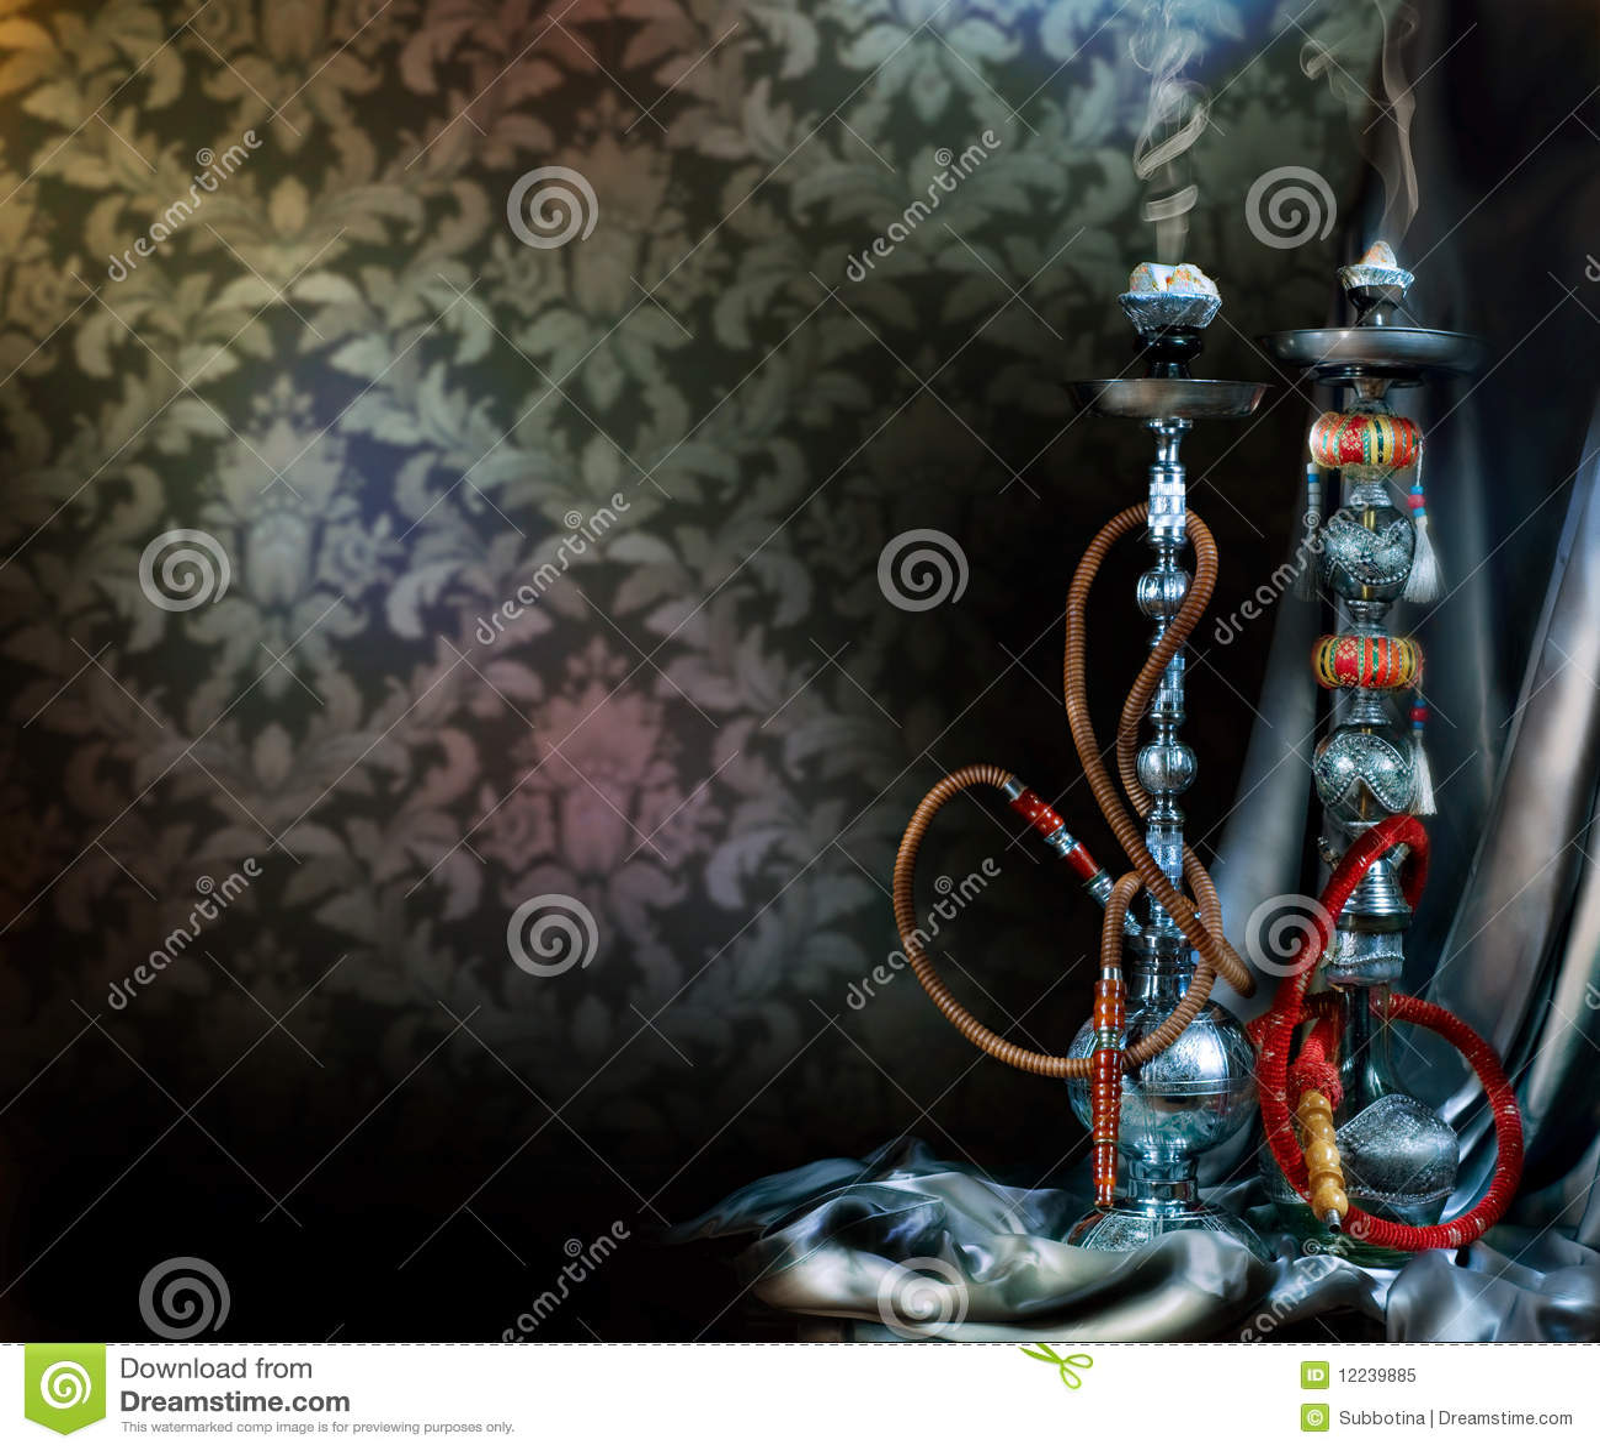 Girl Smoking Hd Wallpaper Hookah Or Shisha Stock Image Image Of Isolated Inhale